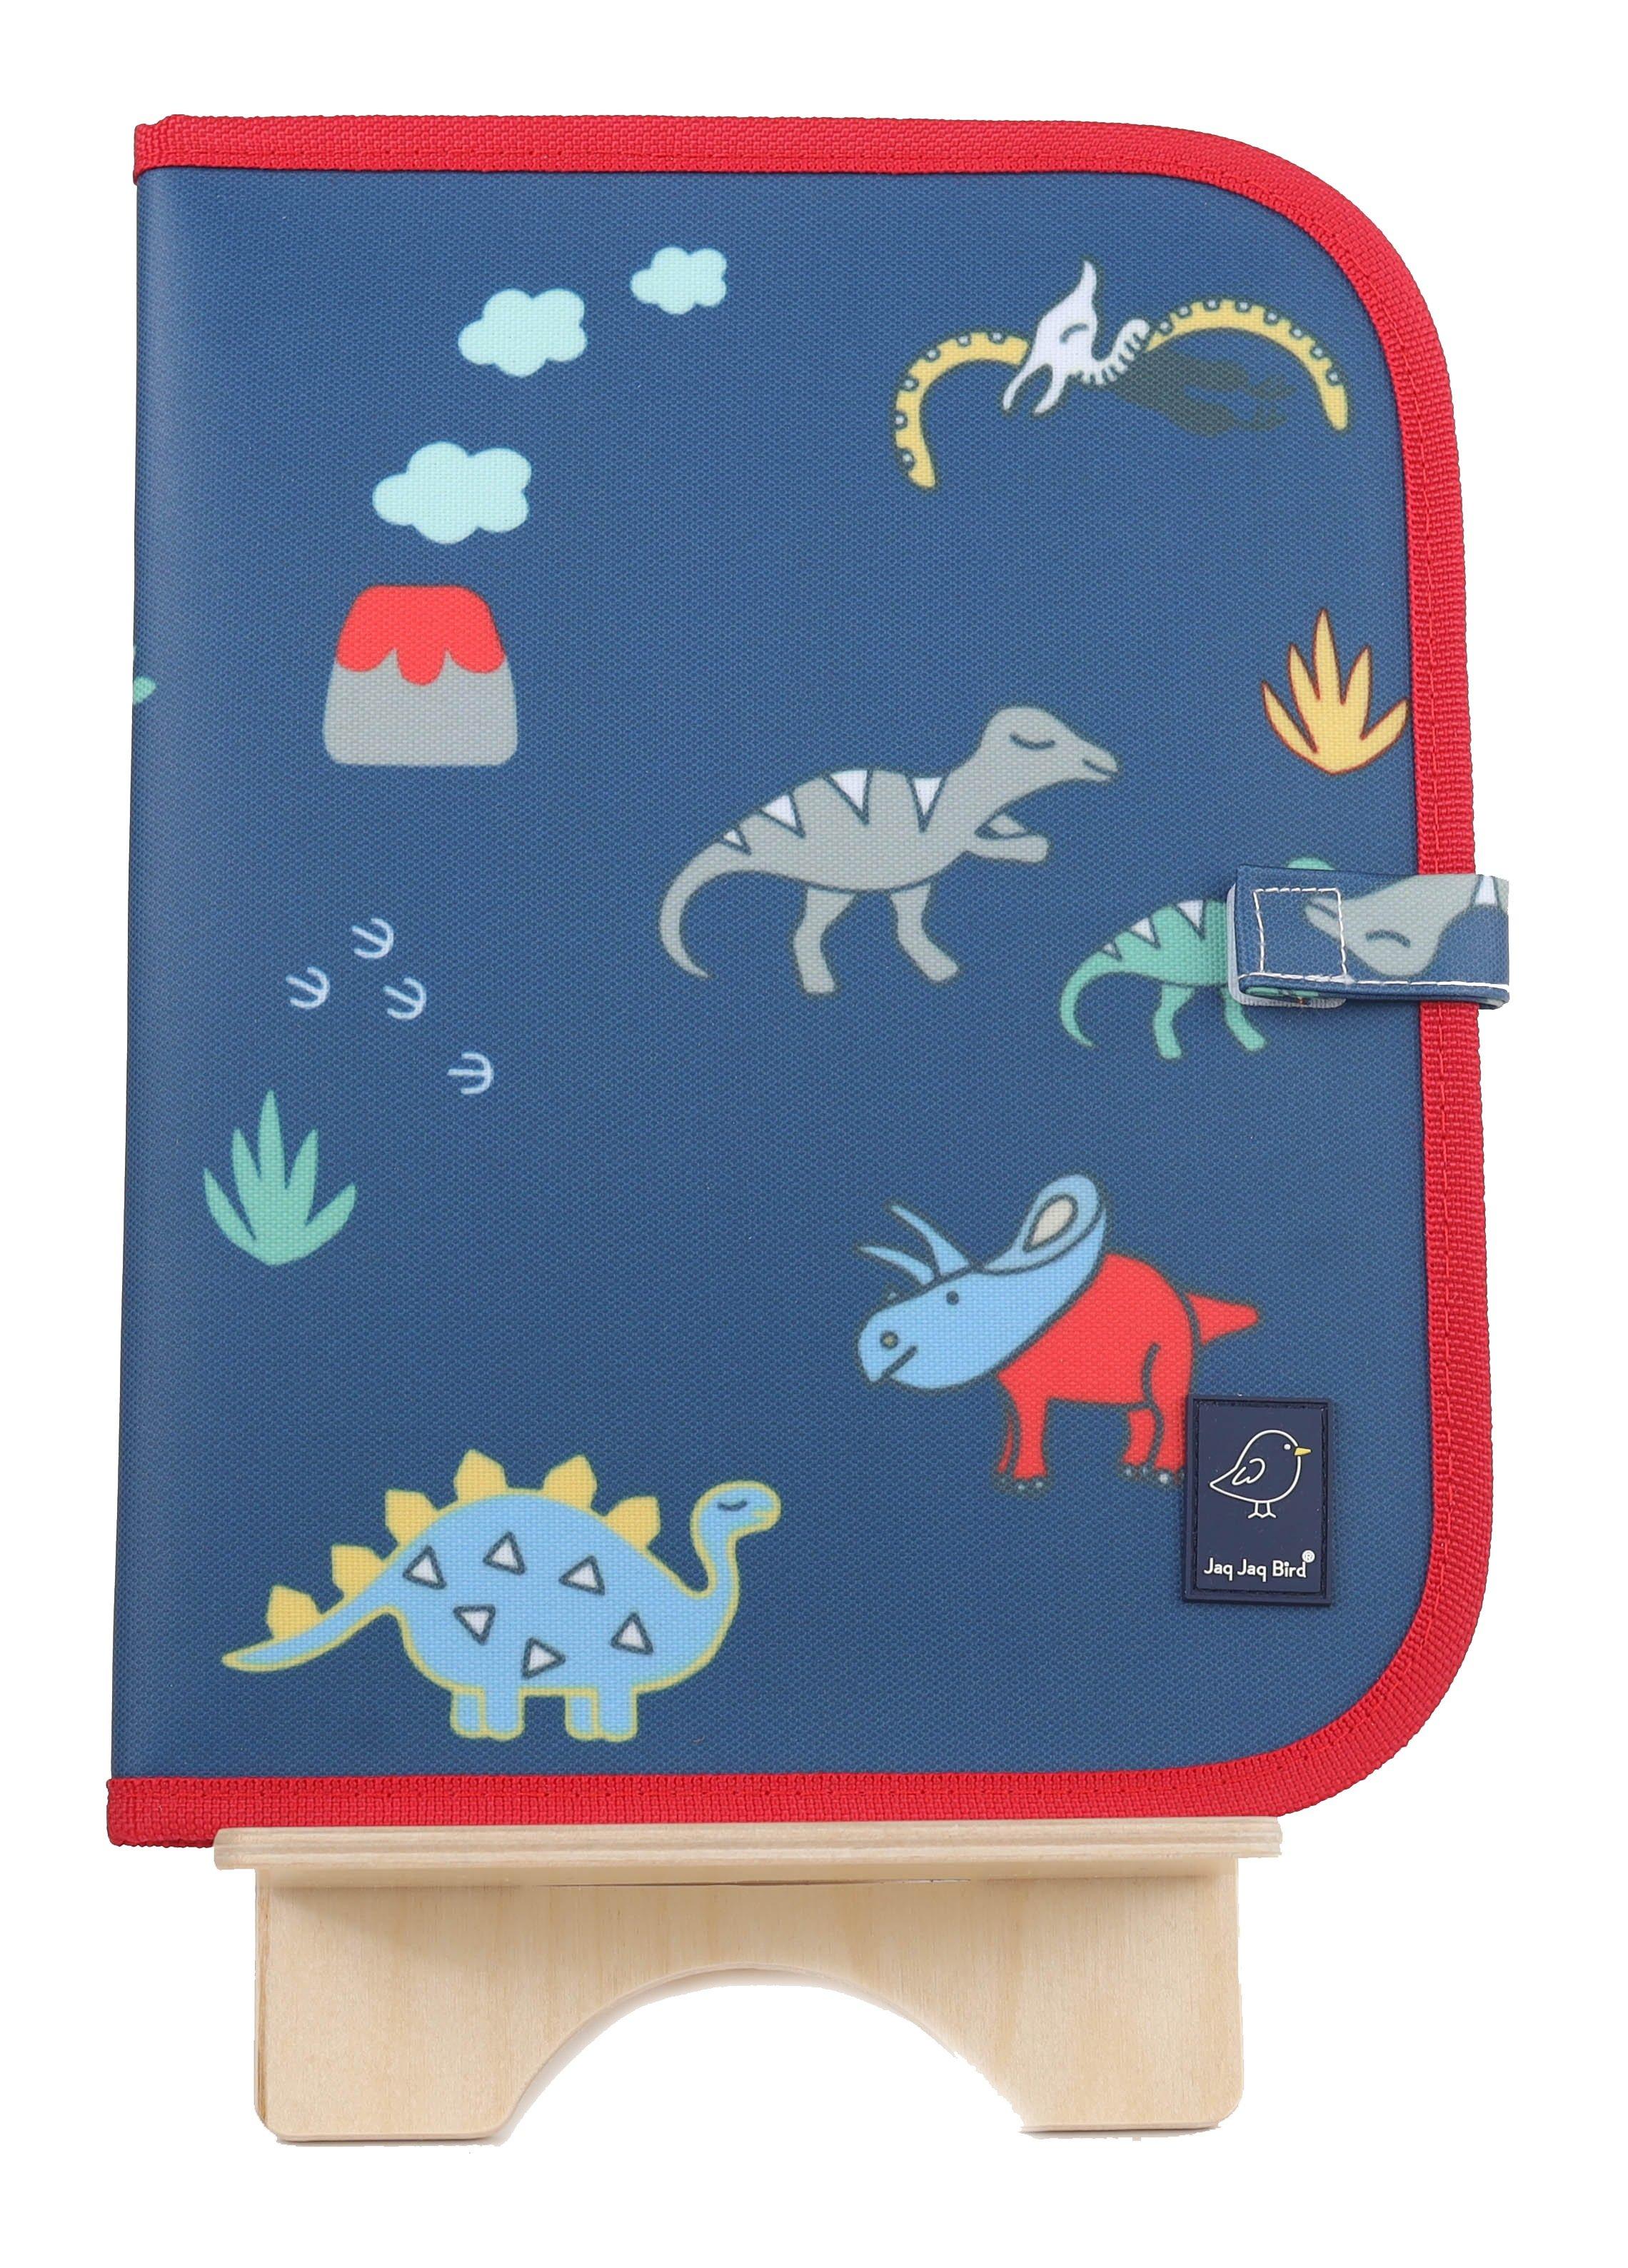 Jaq Jaq Bird - Doodle It & Go Mat - Dinosaur (J-CM-DINO2-261)